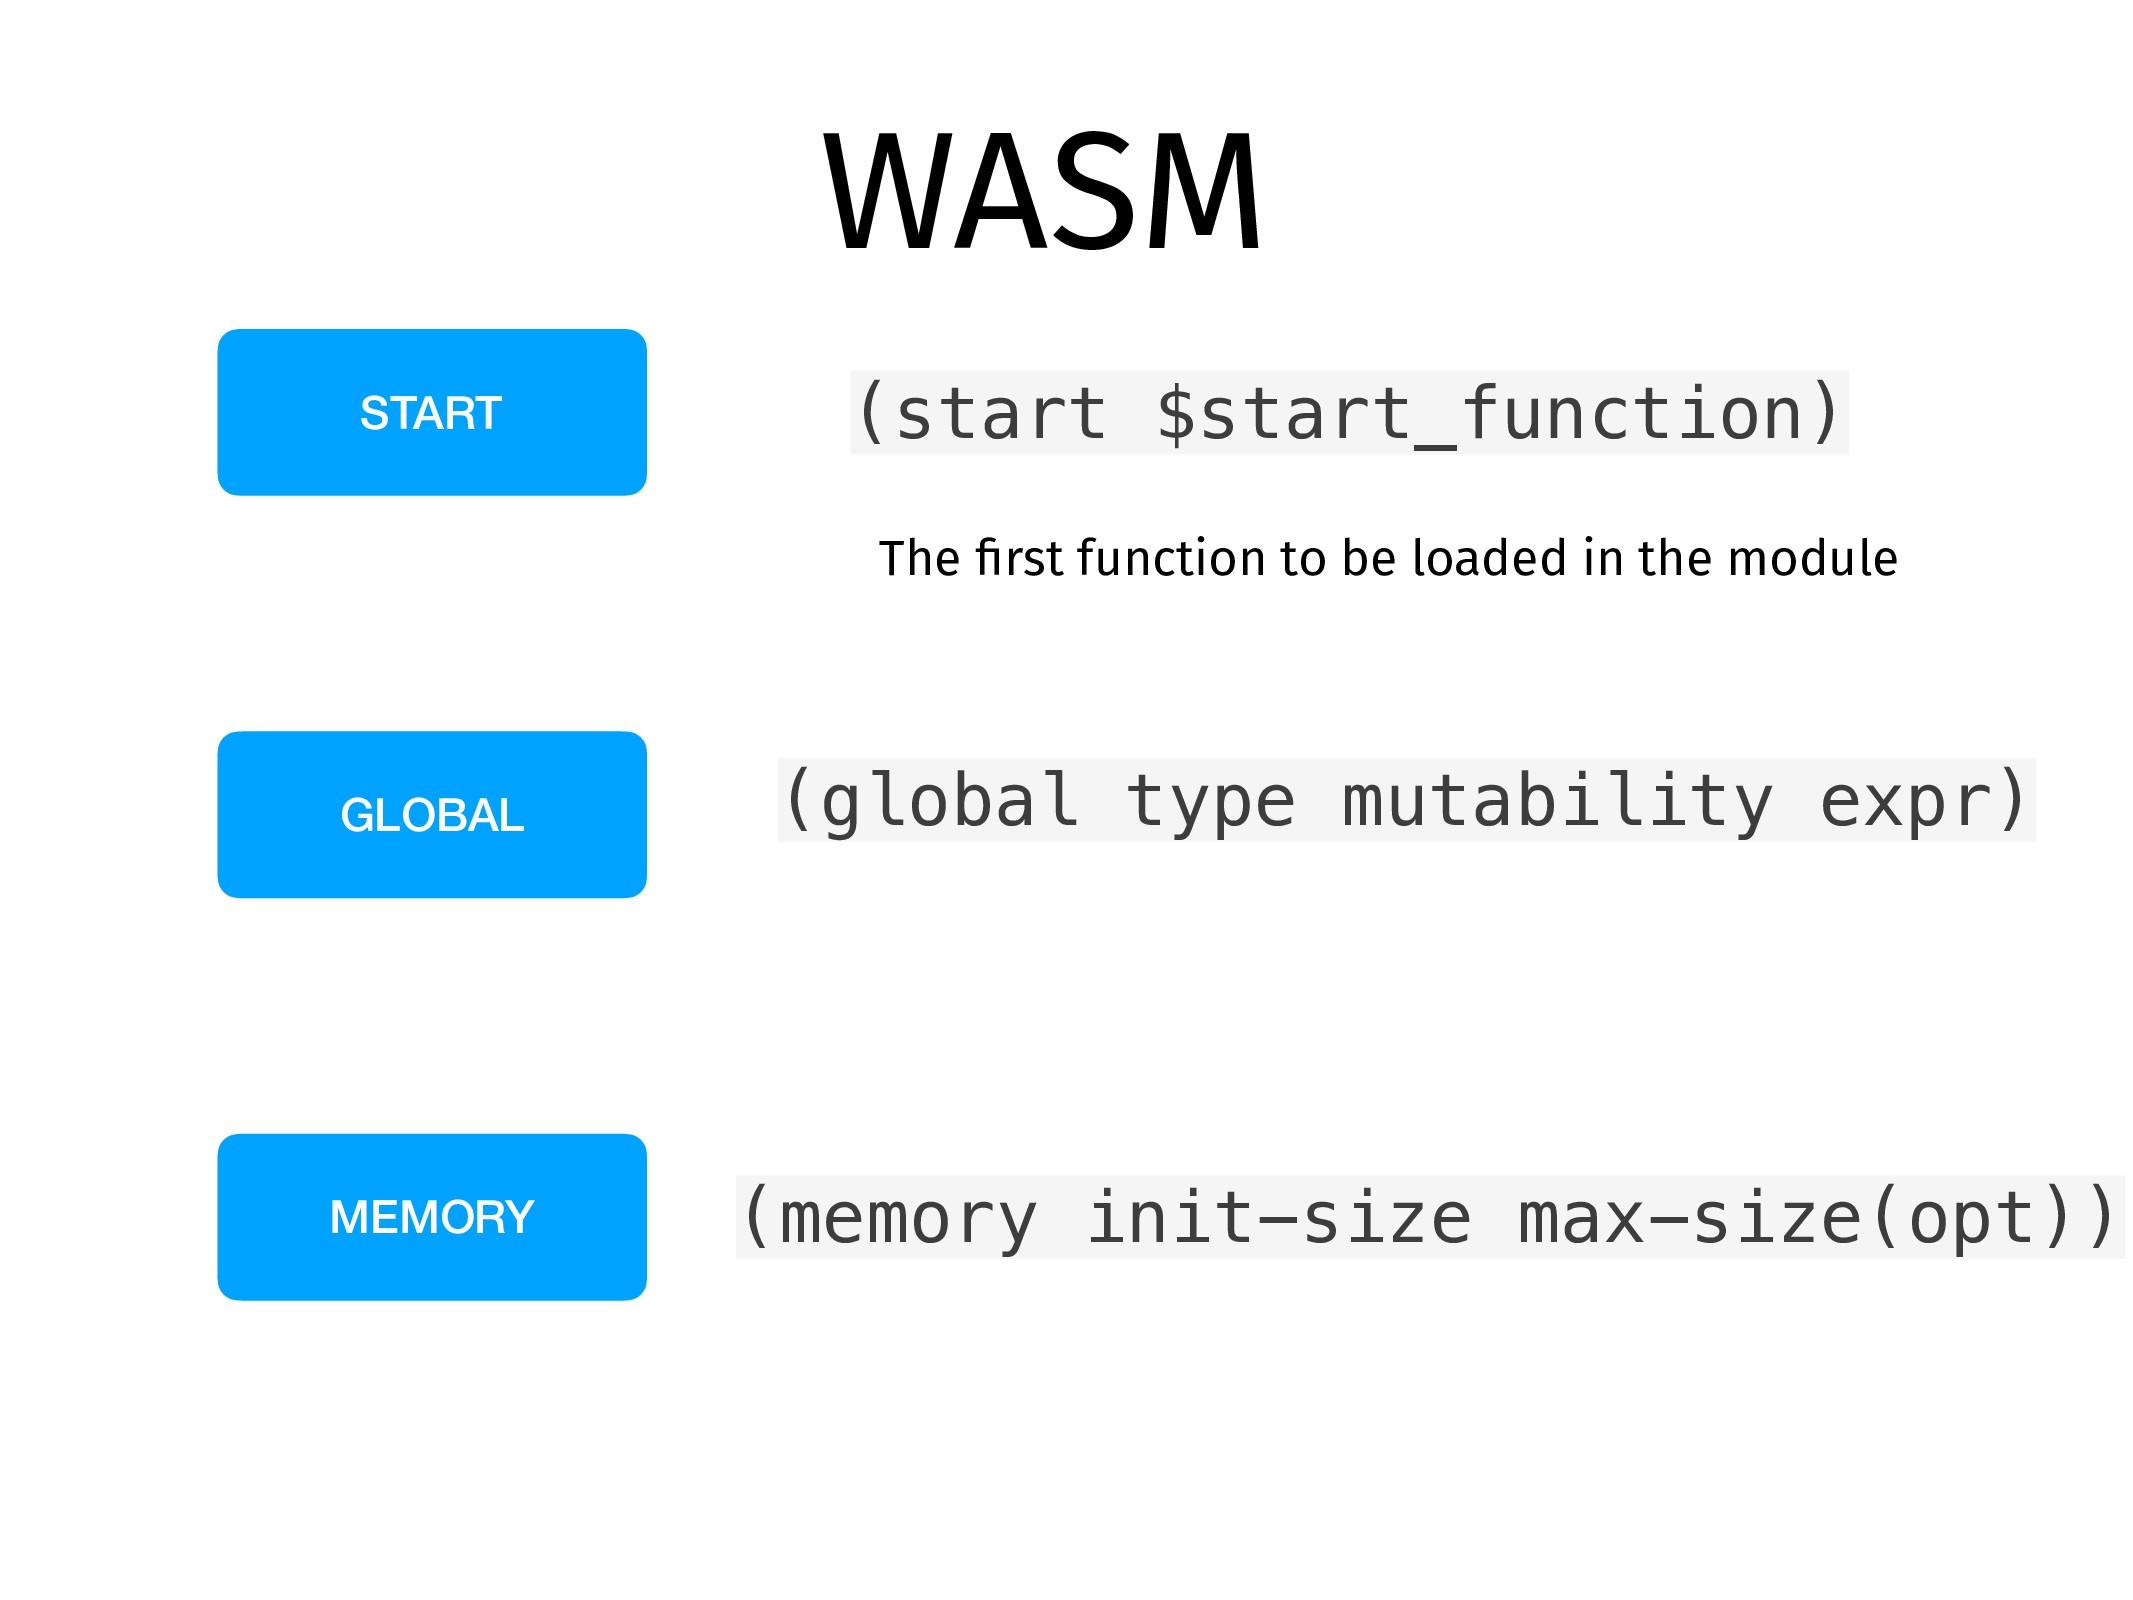 WASM MEMORY GLOBAL START (start $start_function...